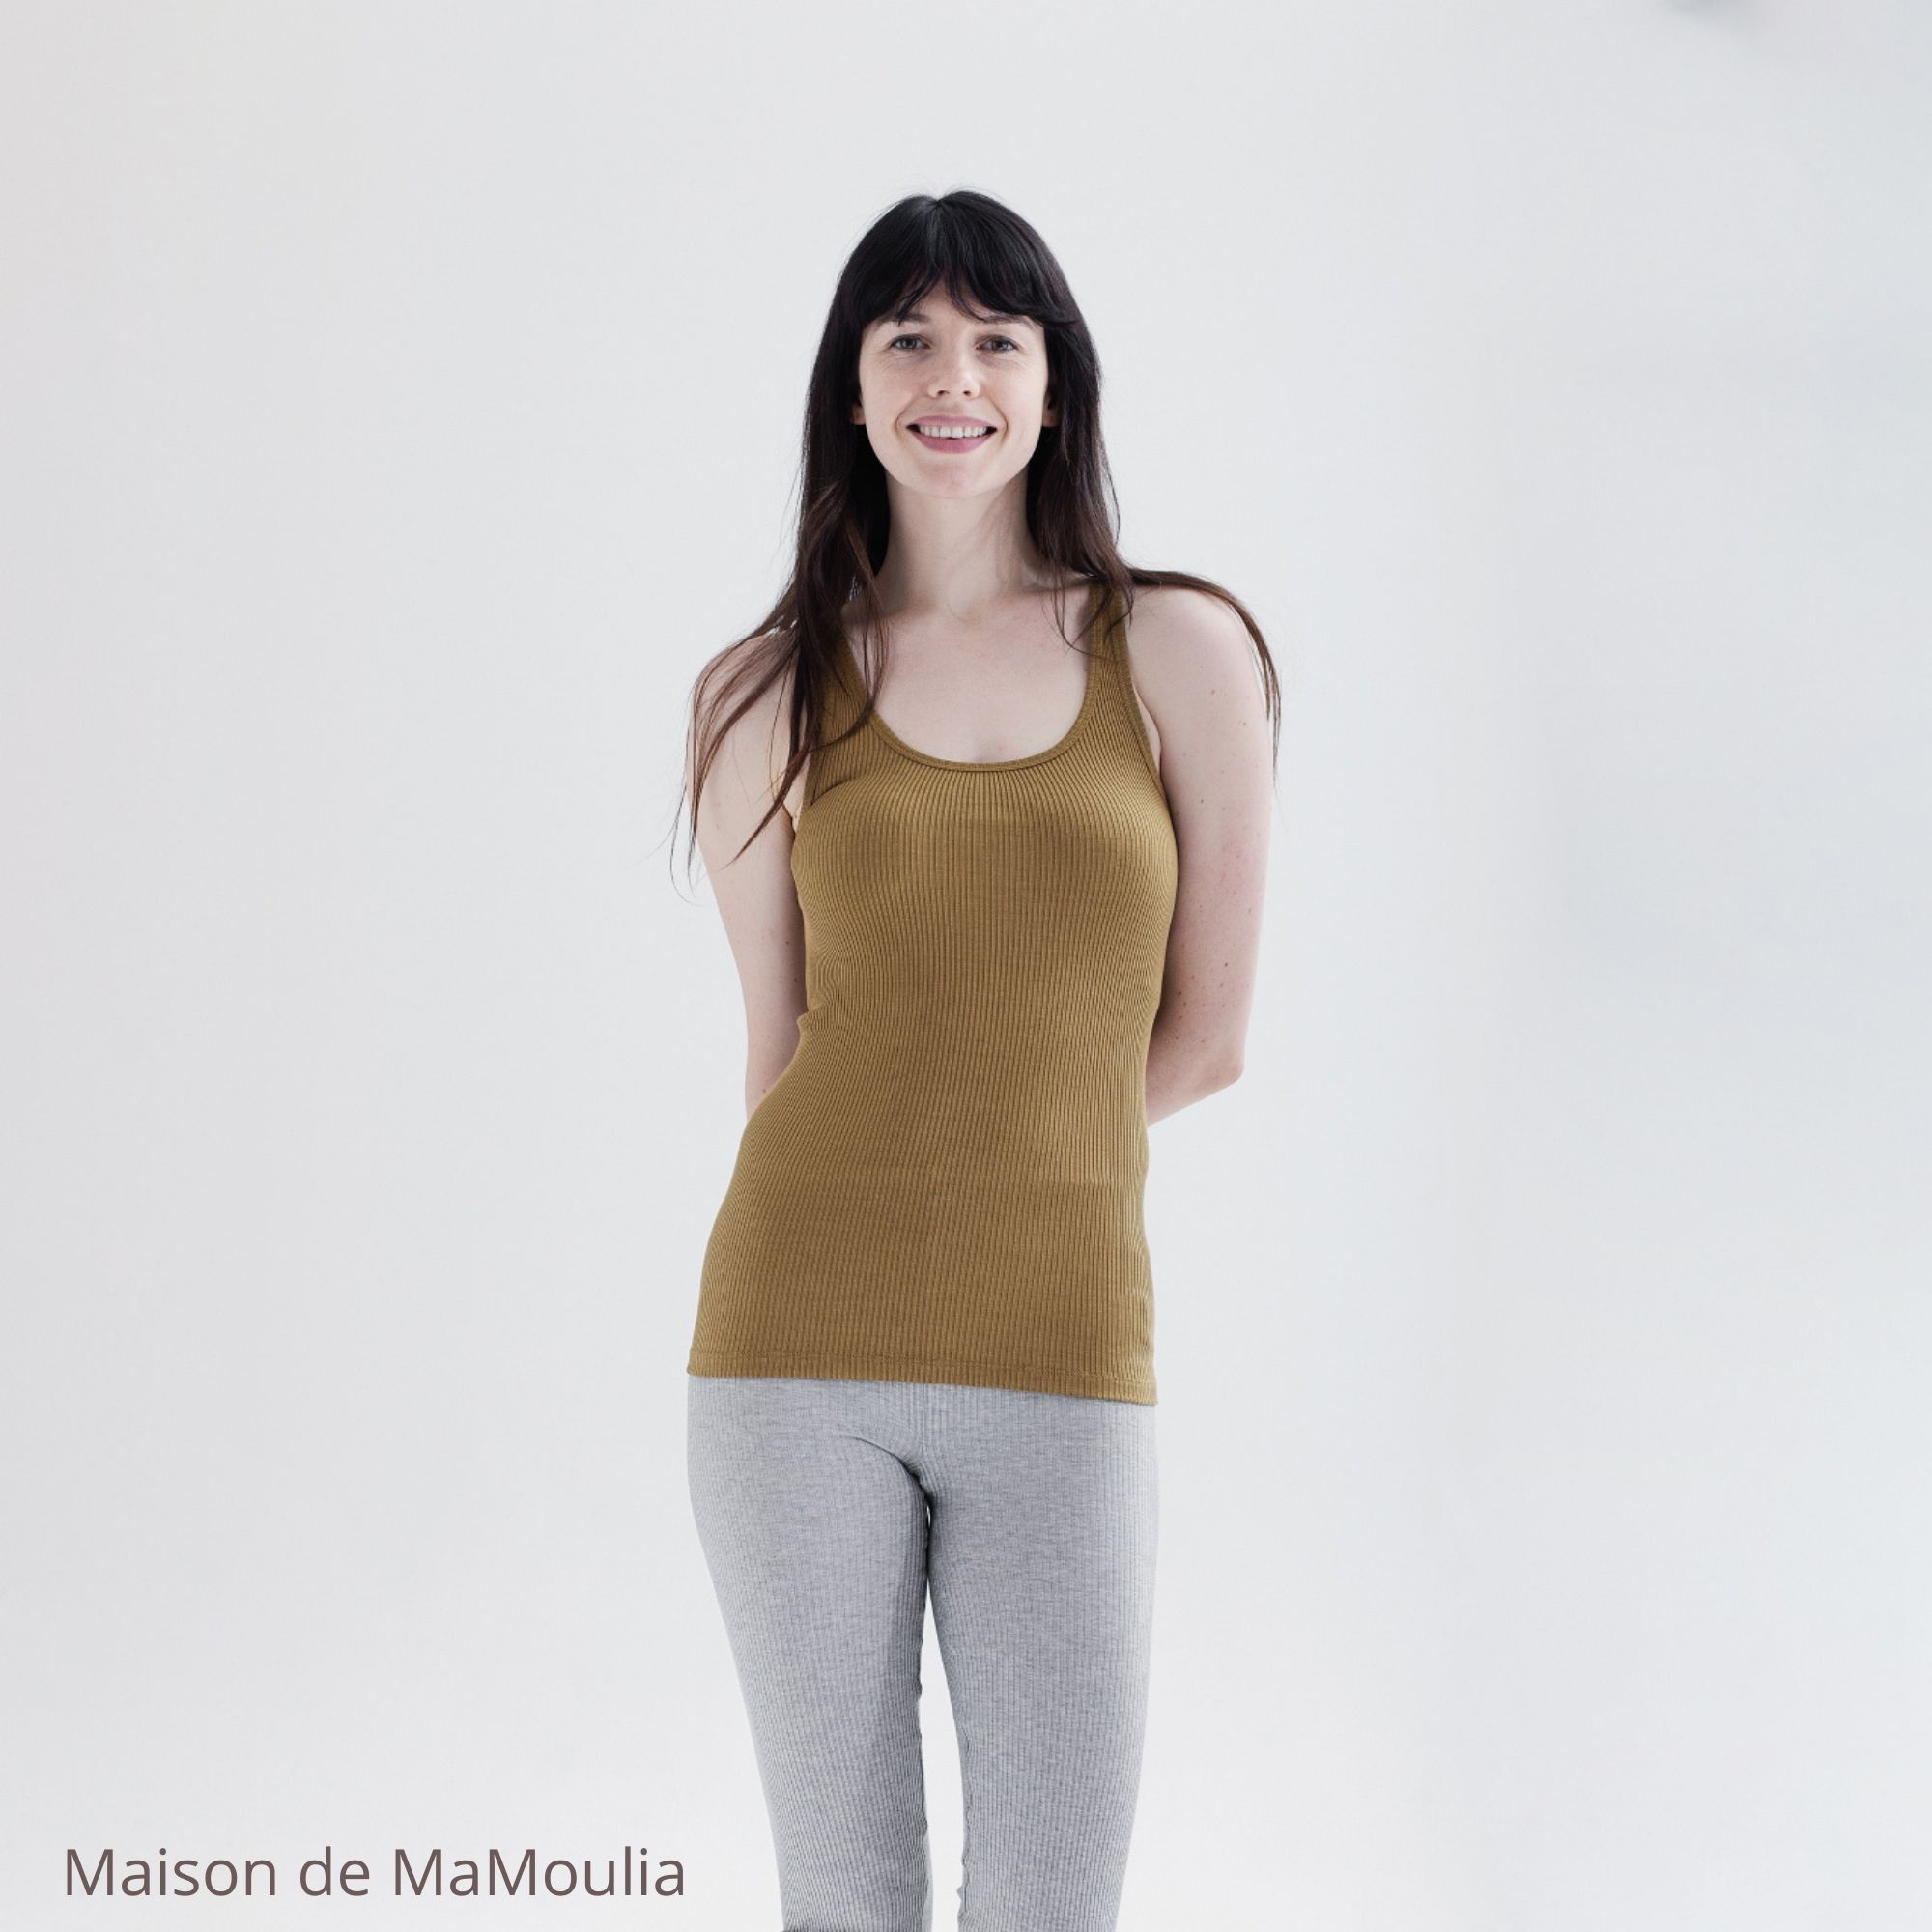 MINIMALISMA - Débardeur femme - Soie 70% / coton 30% - Seaweed